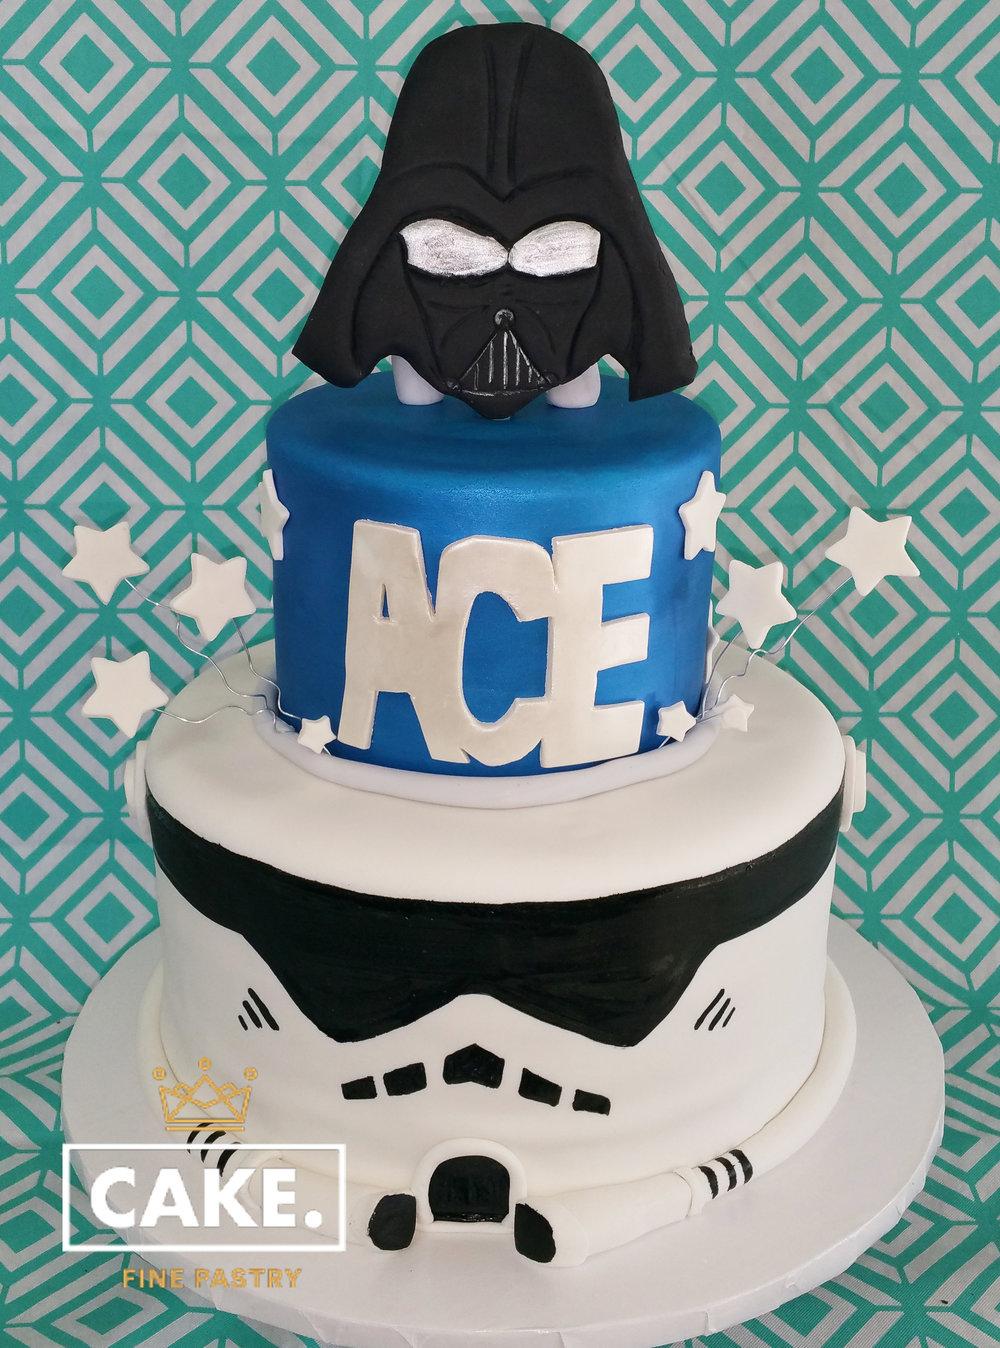 starwars cake.jpg